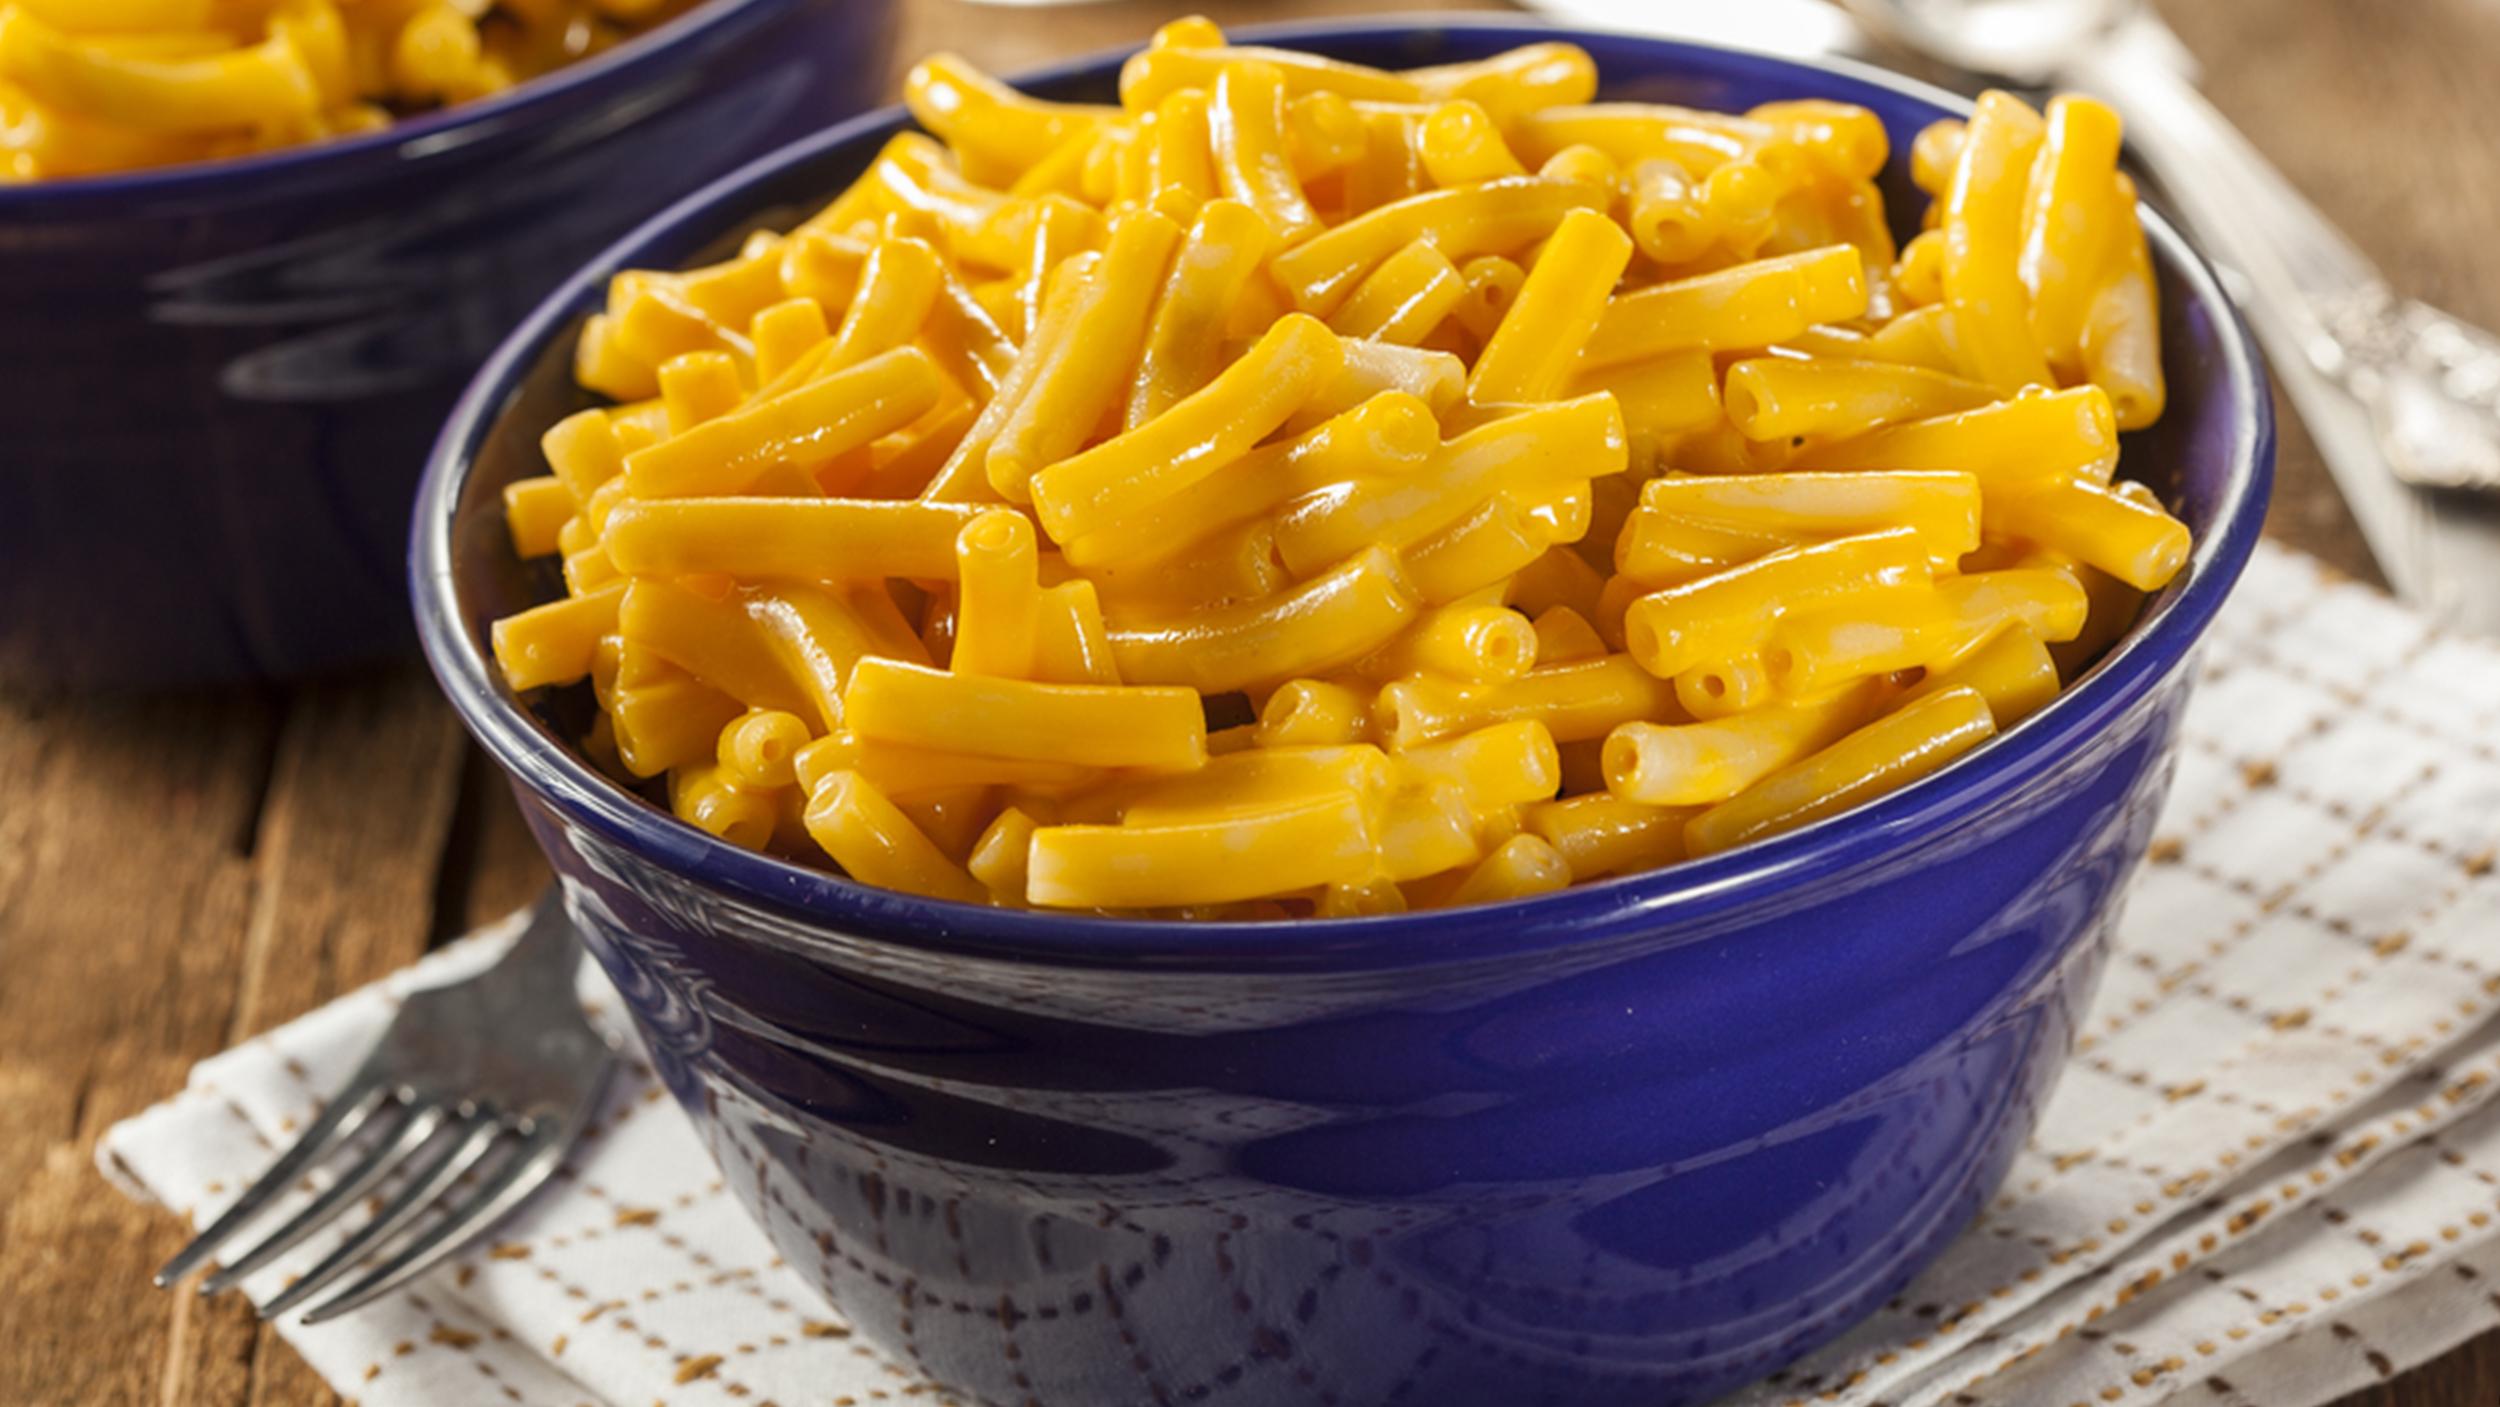 box-mac-and-cheese-stock-today-160620-tease_8ee678c0a973706cc656ddadf76e3ba6.jpg